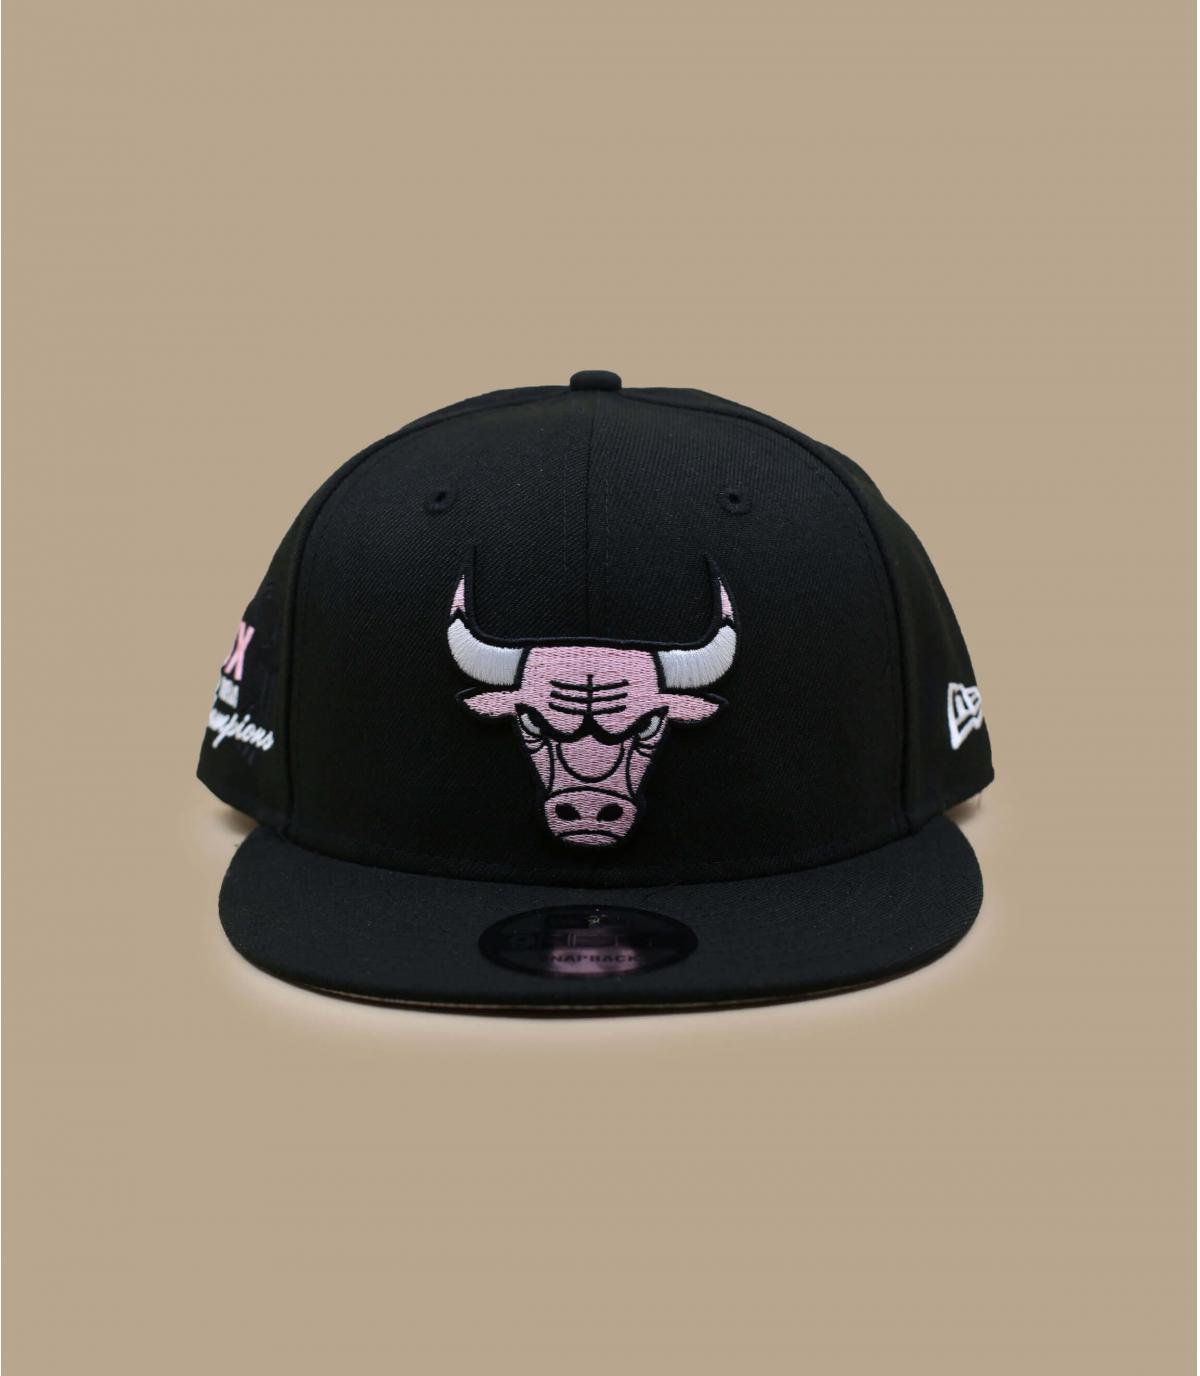 Bulls cap pink paisley